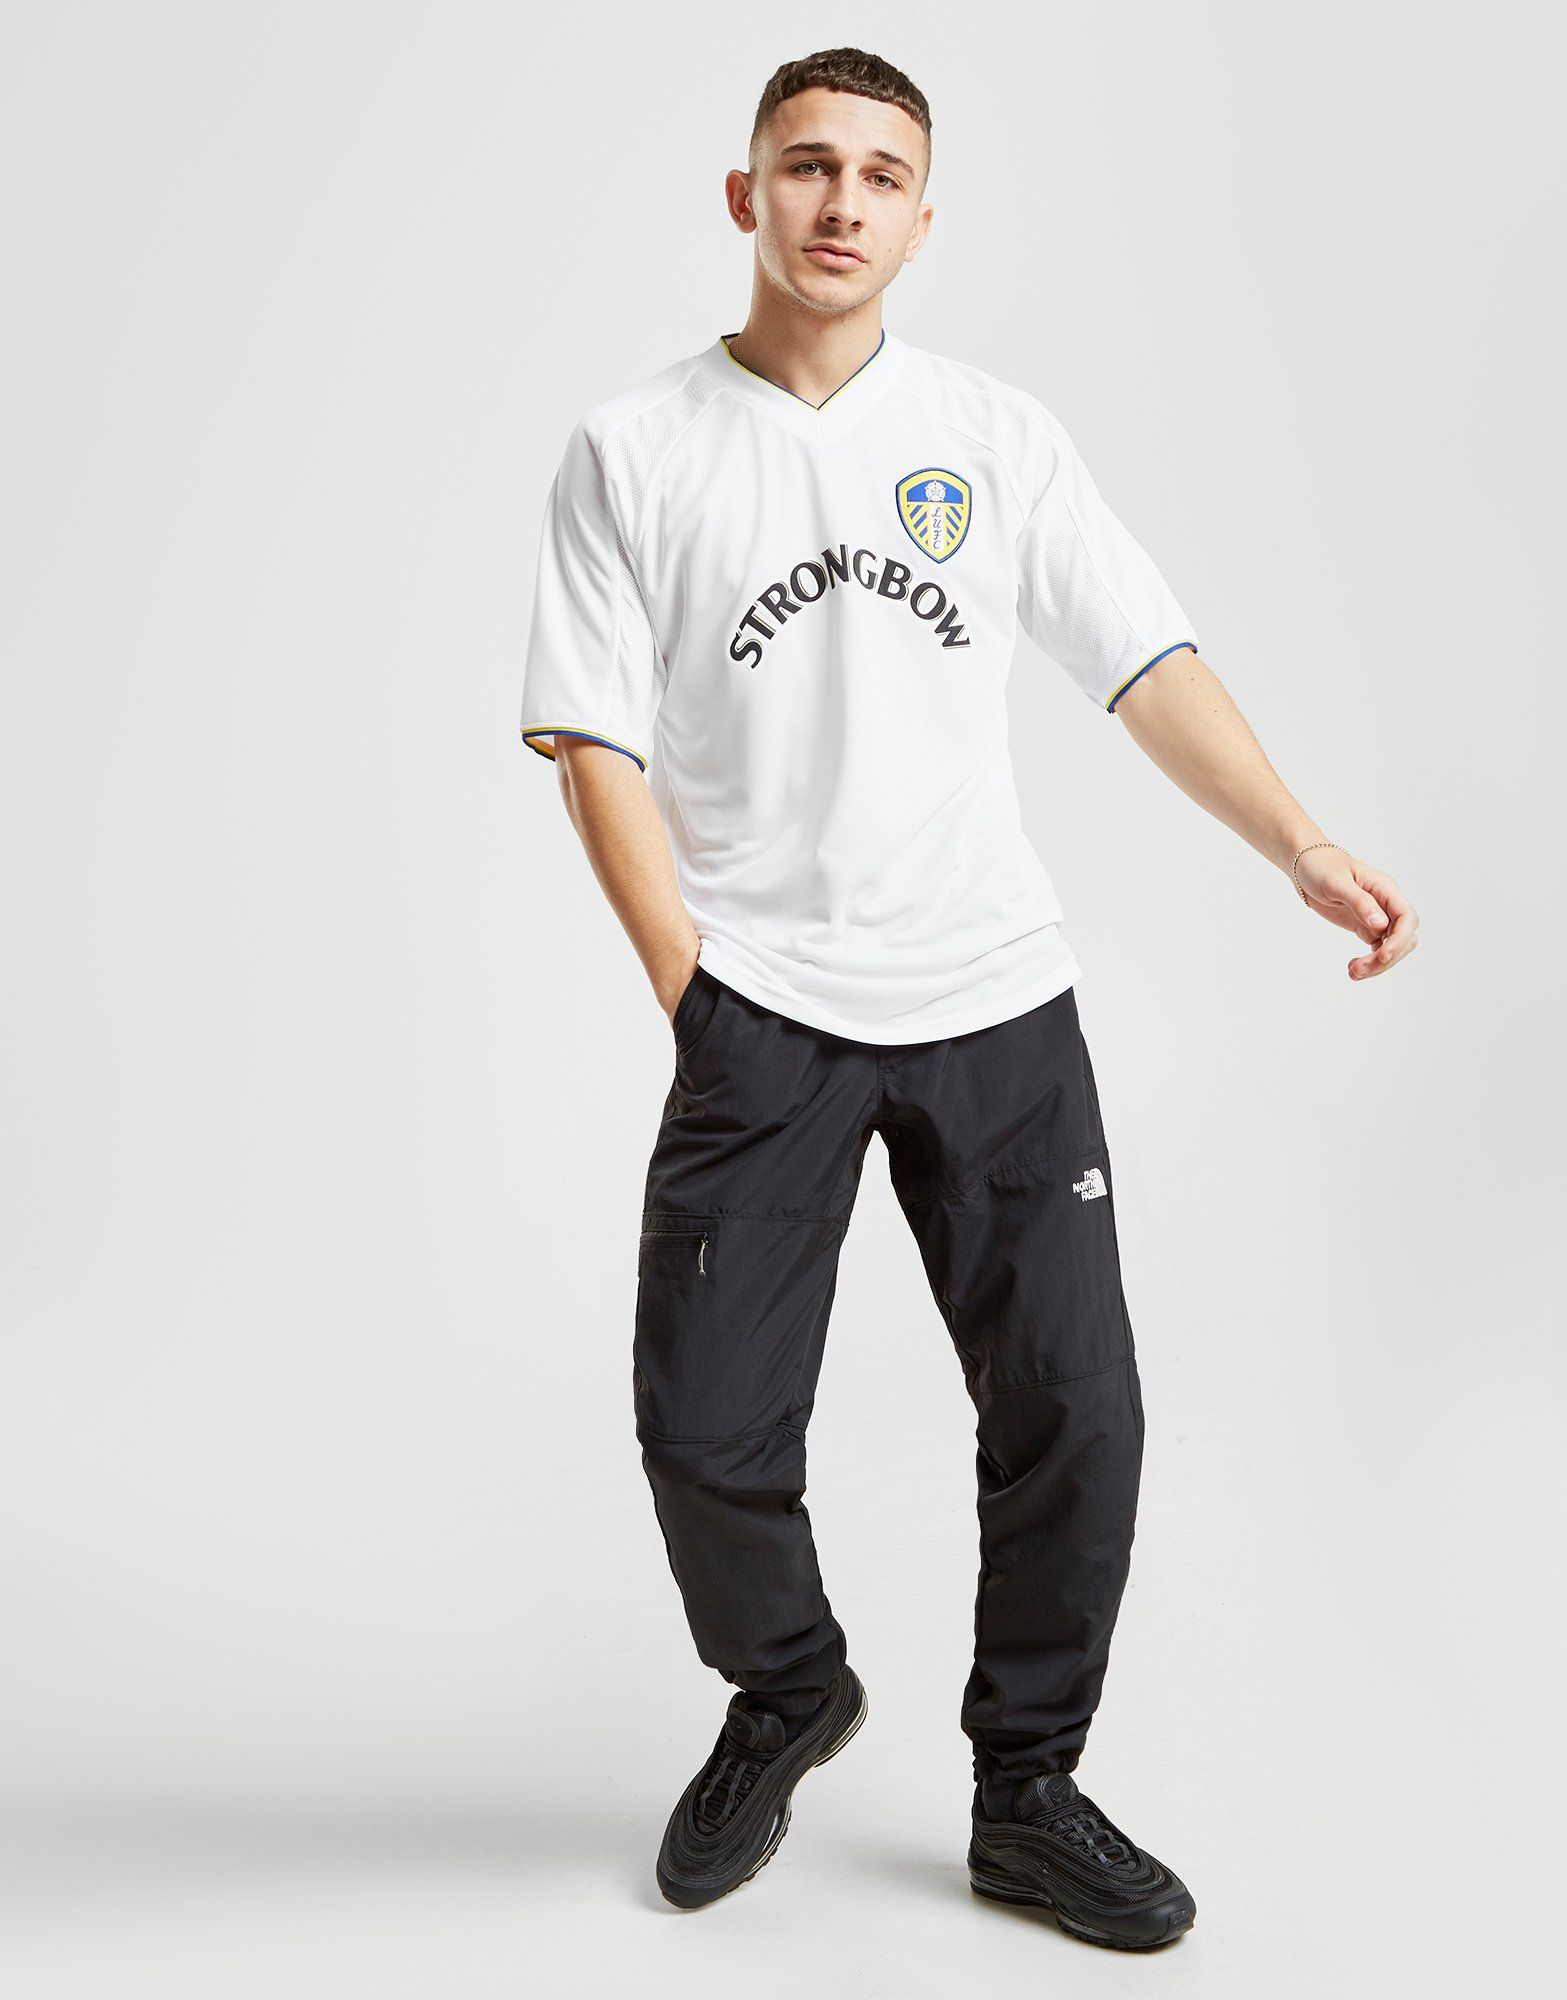 Score Draw Leeds United FC '01 Home Shirt